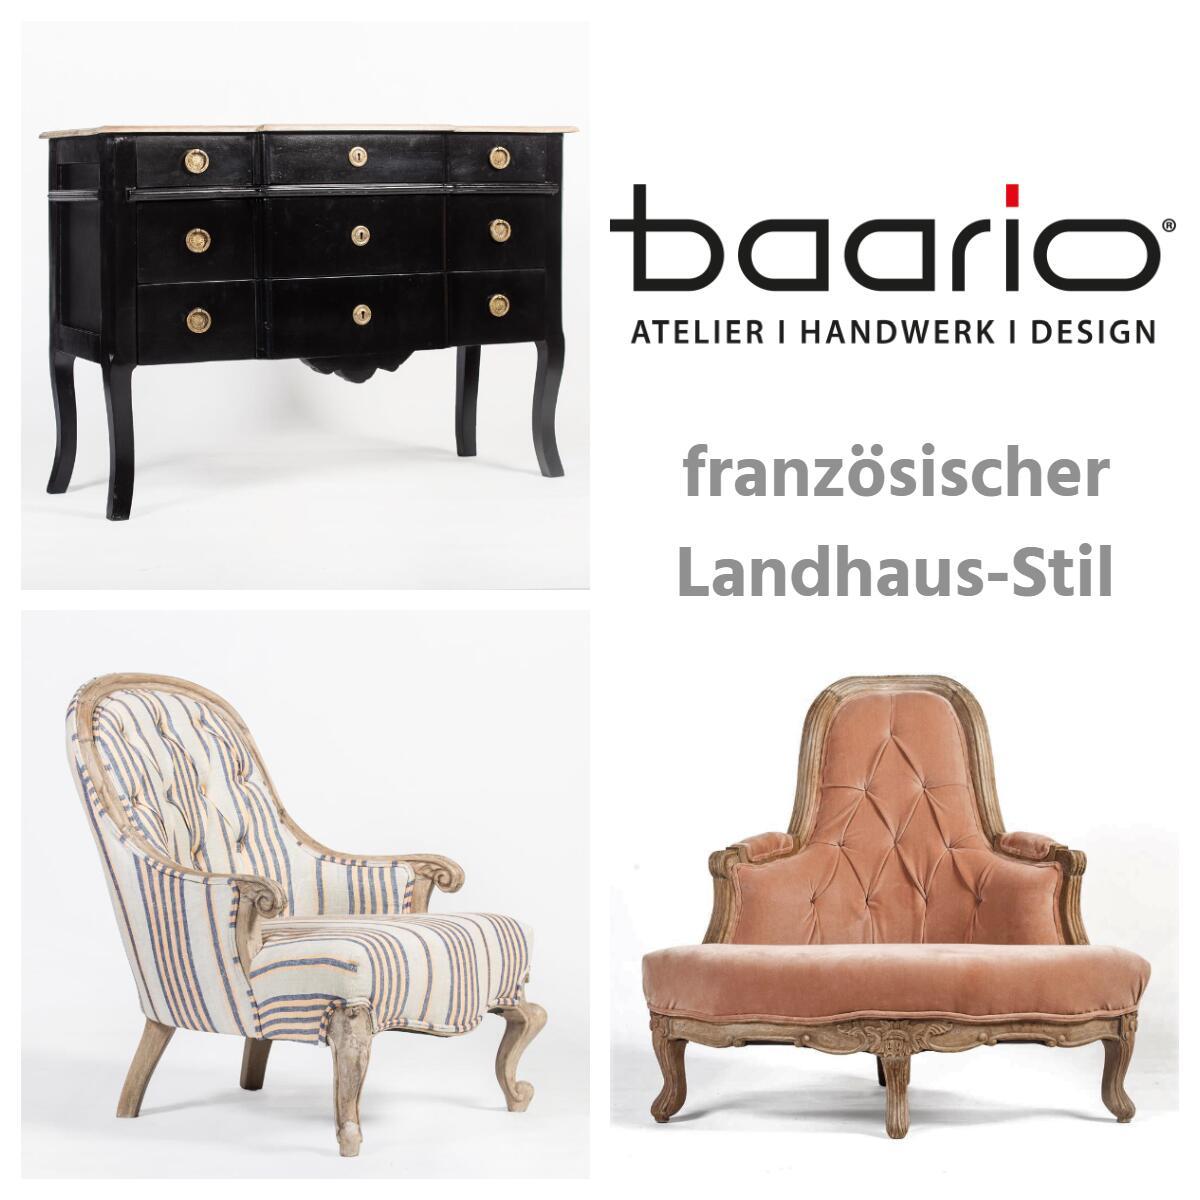 franzoesischer-landhausstil-moebel-shop